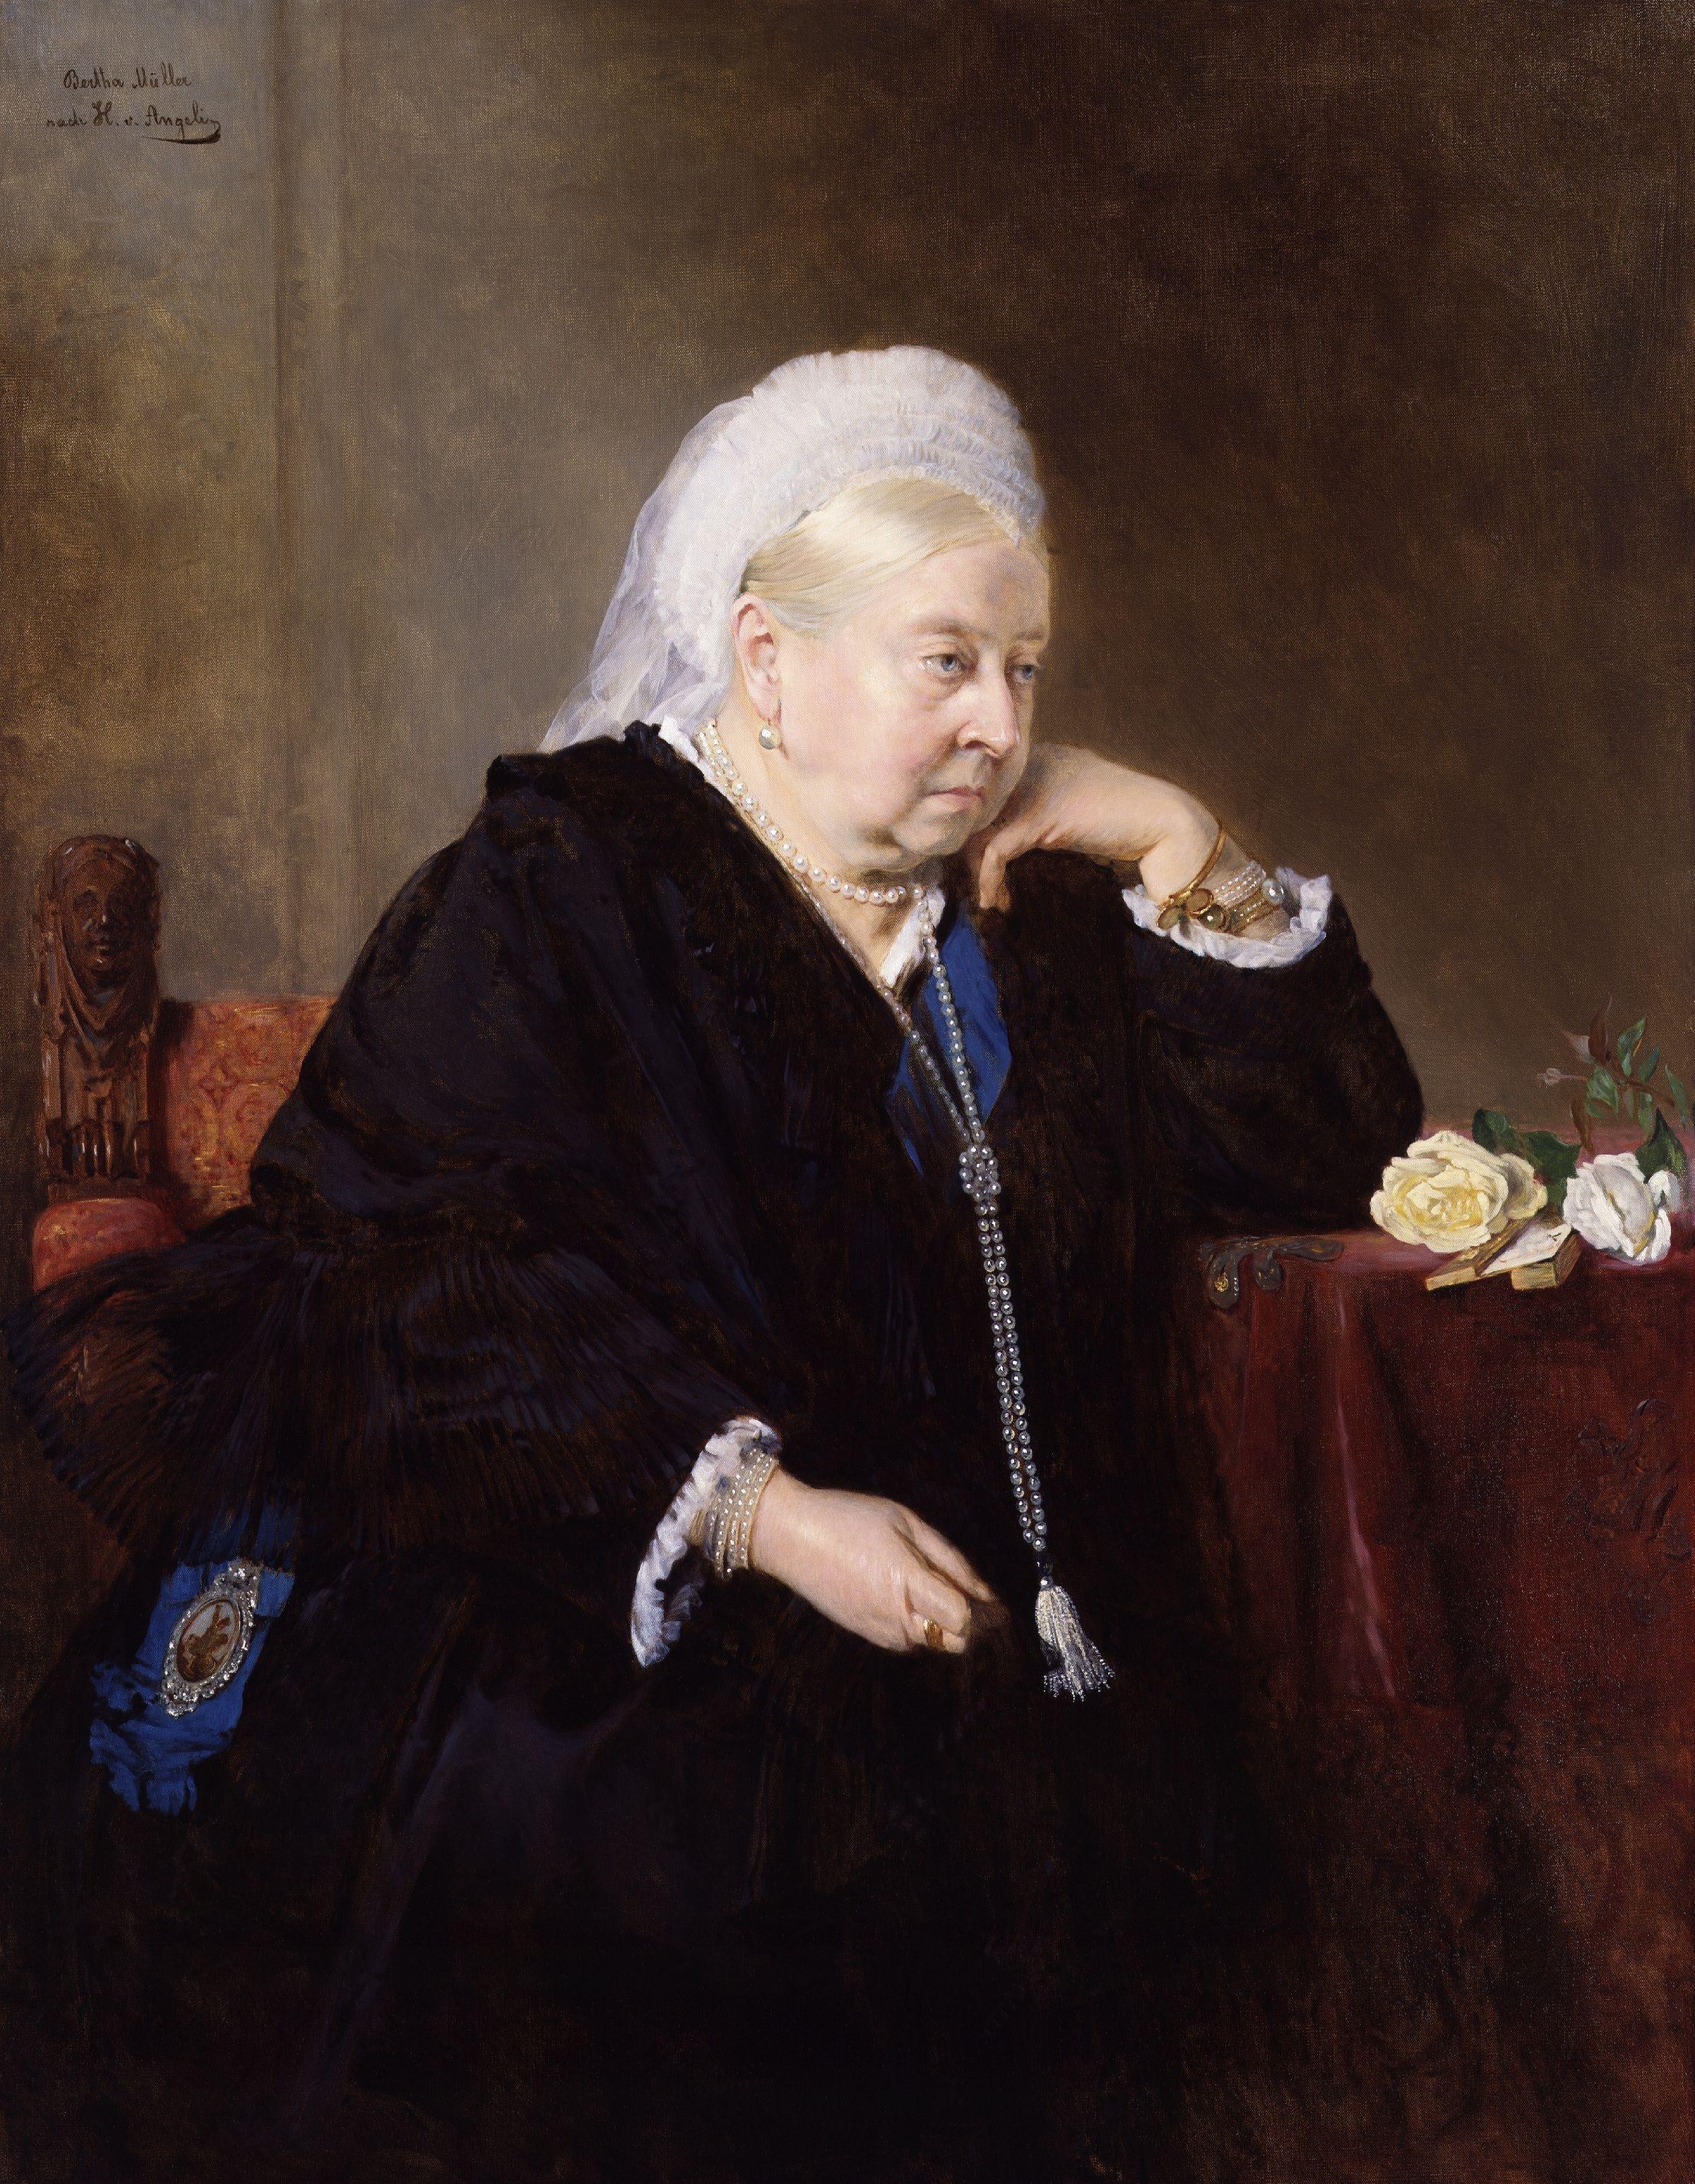 Portrait of Princess Victoria of Prussia (1840-1901